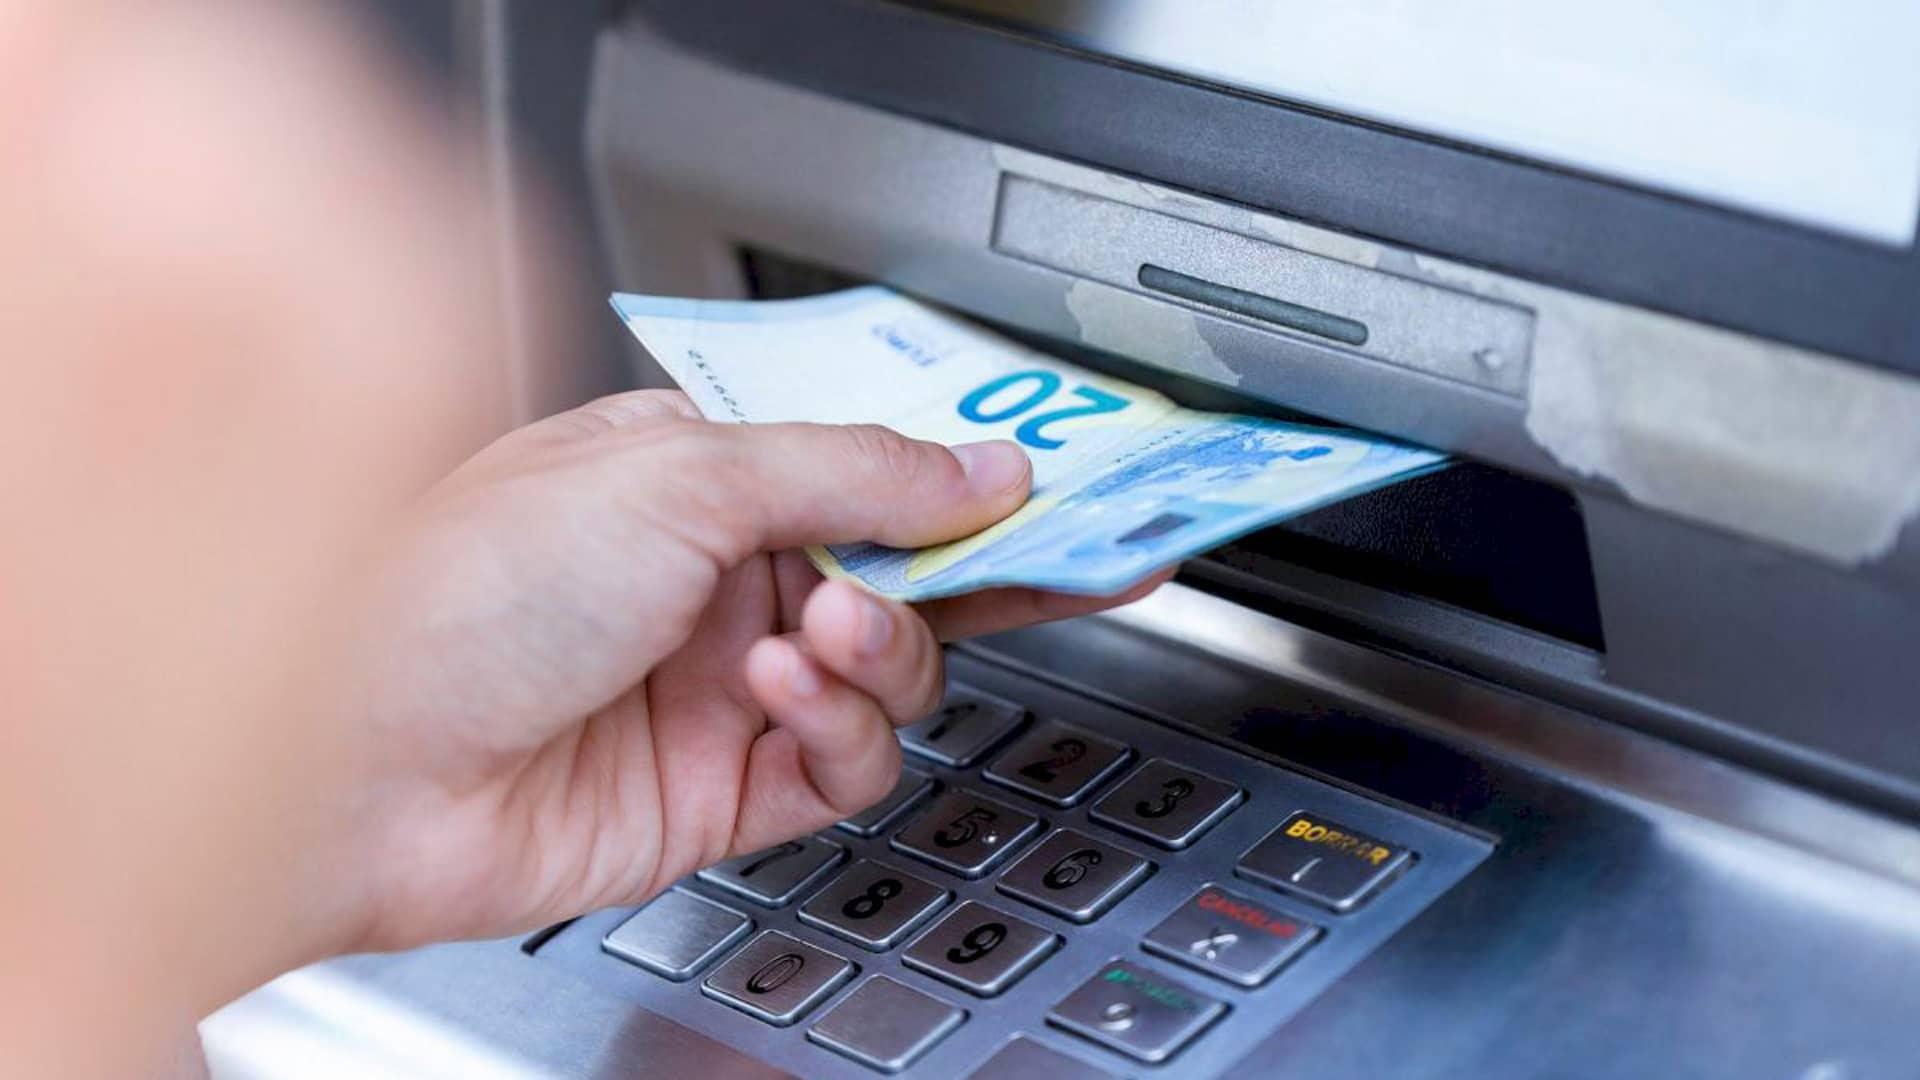 Sacar dinero sin tarjeta Bankinter: Hal Cash